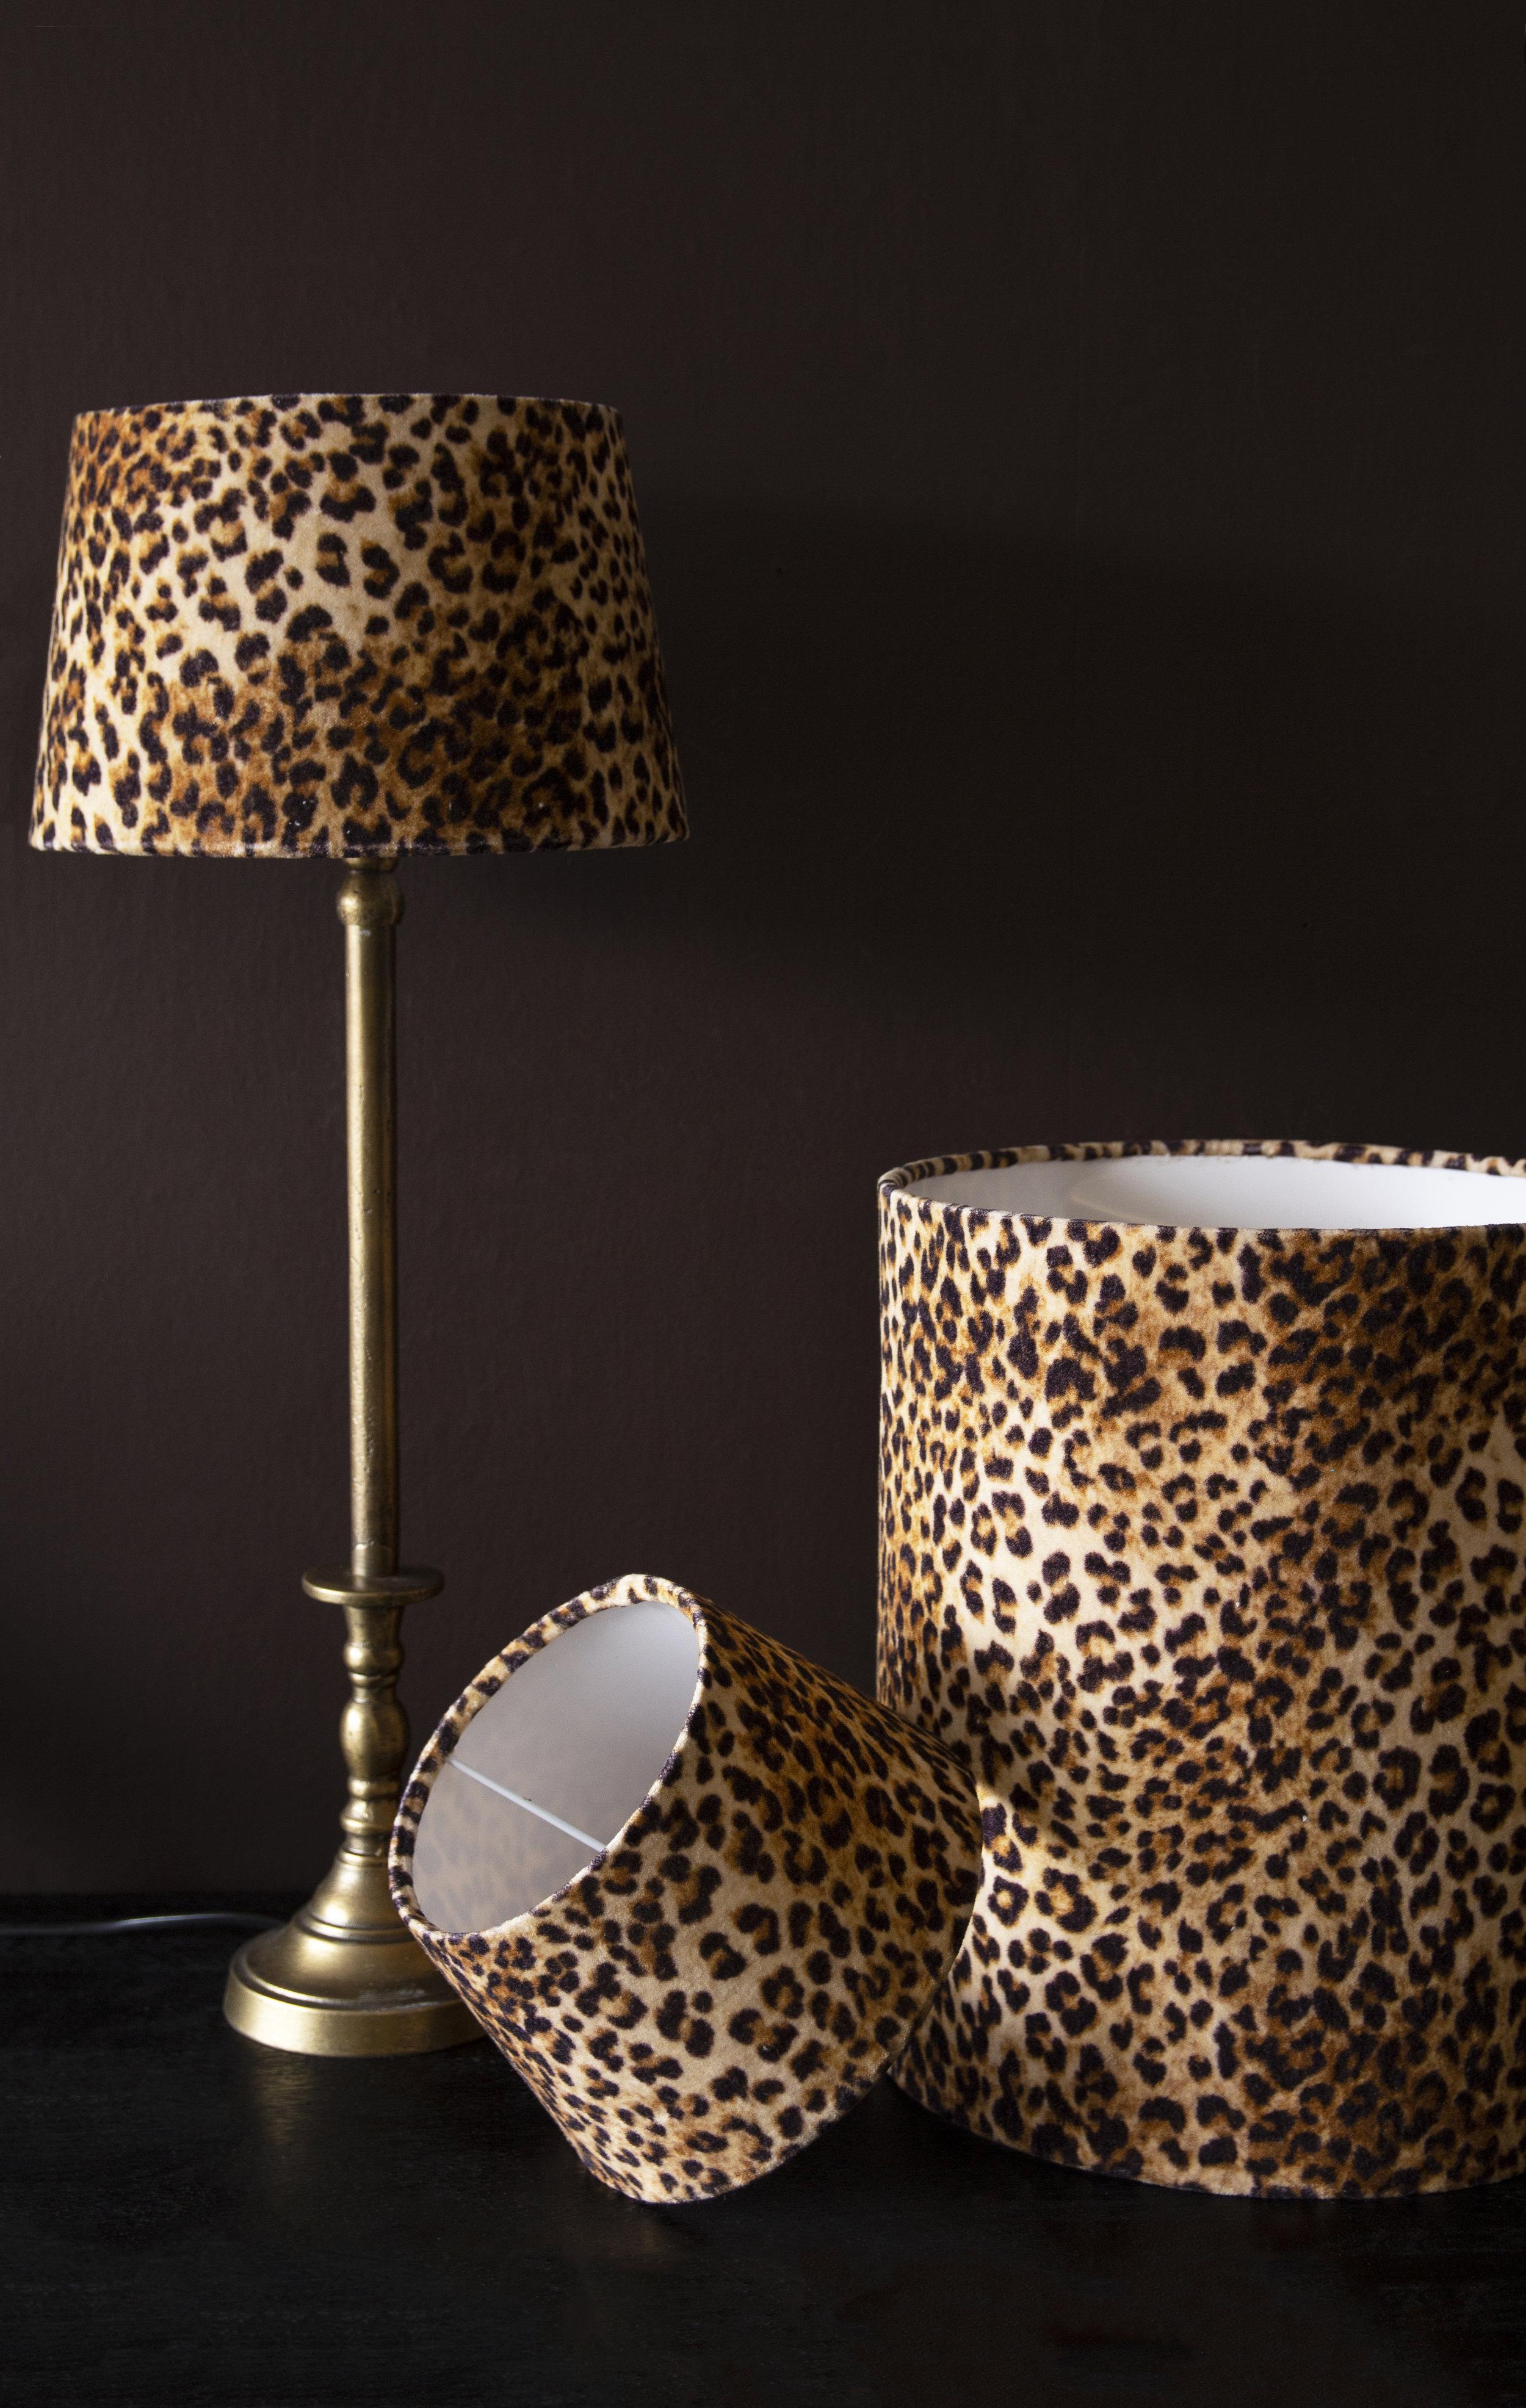 rockettstgeorge_leopard_print_velvet_lampshades_lifestyle_highres copy2.jpg